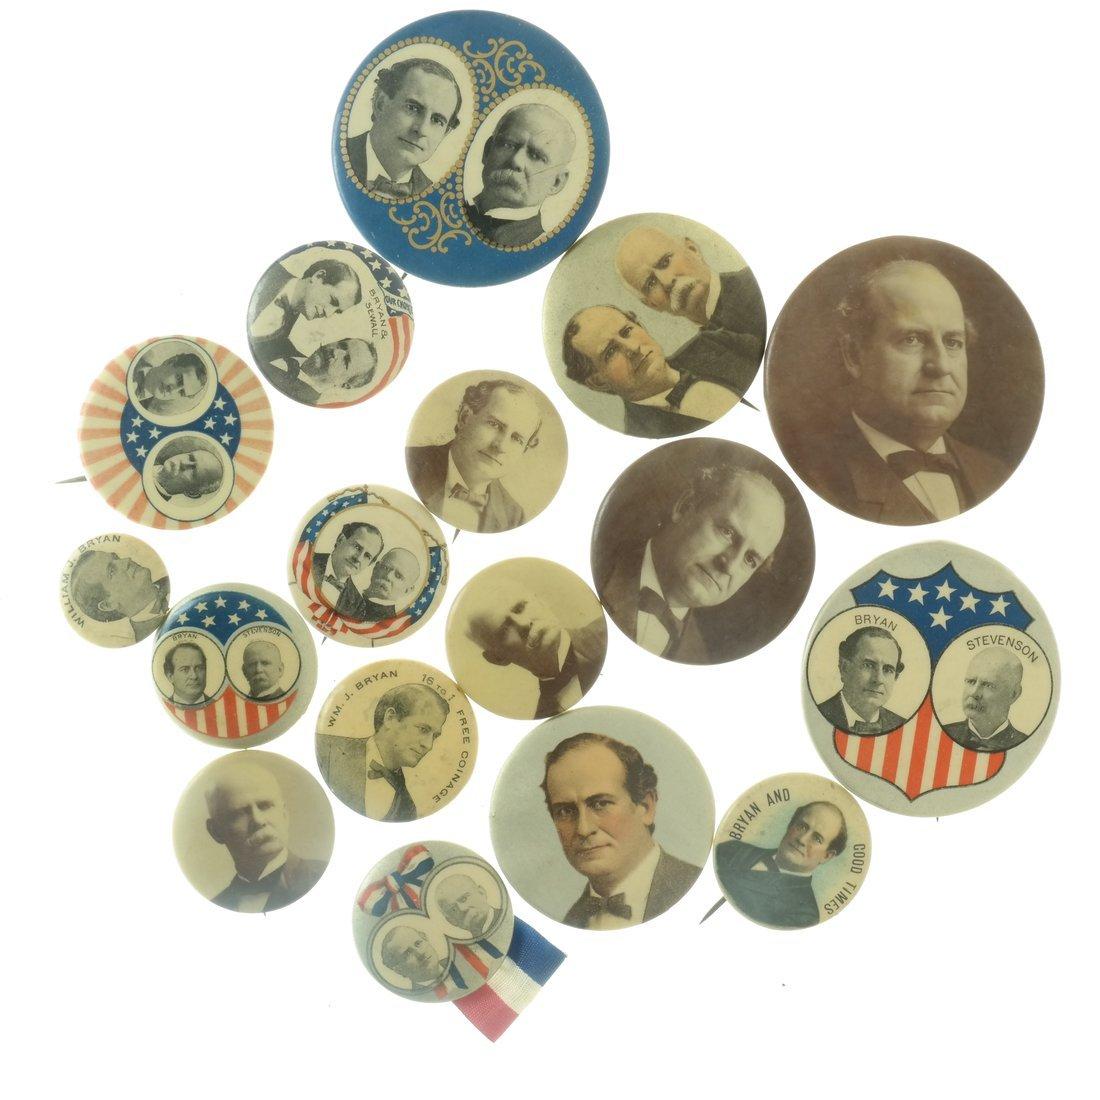 W.J. Bryan - Seventeen 1900 Items